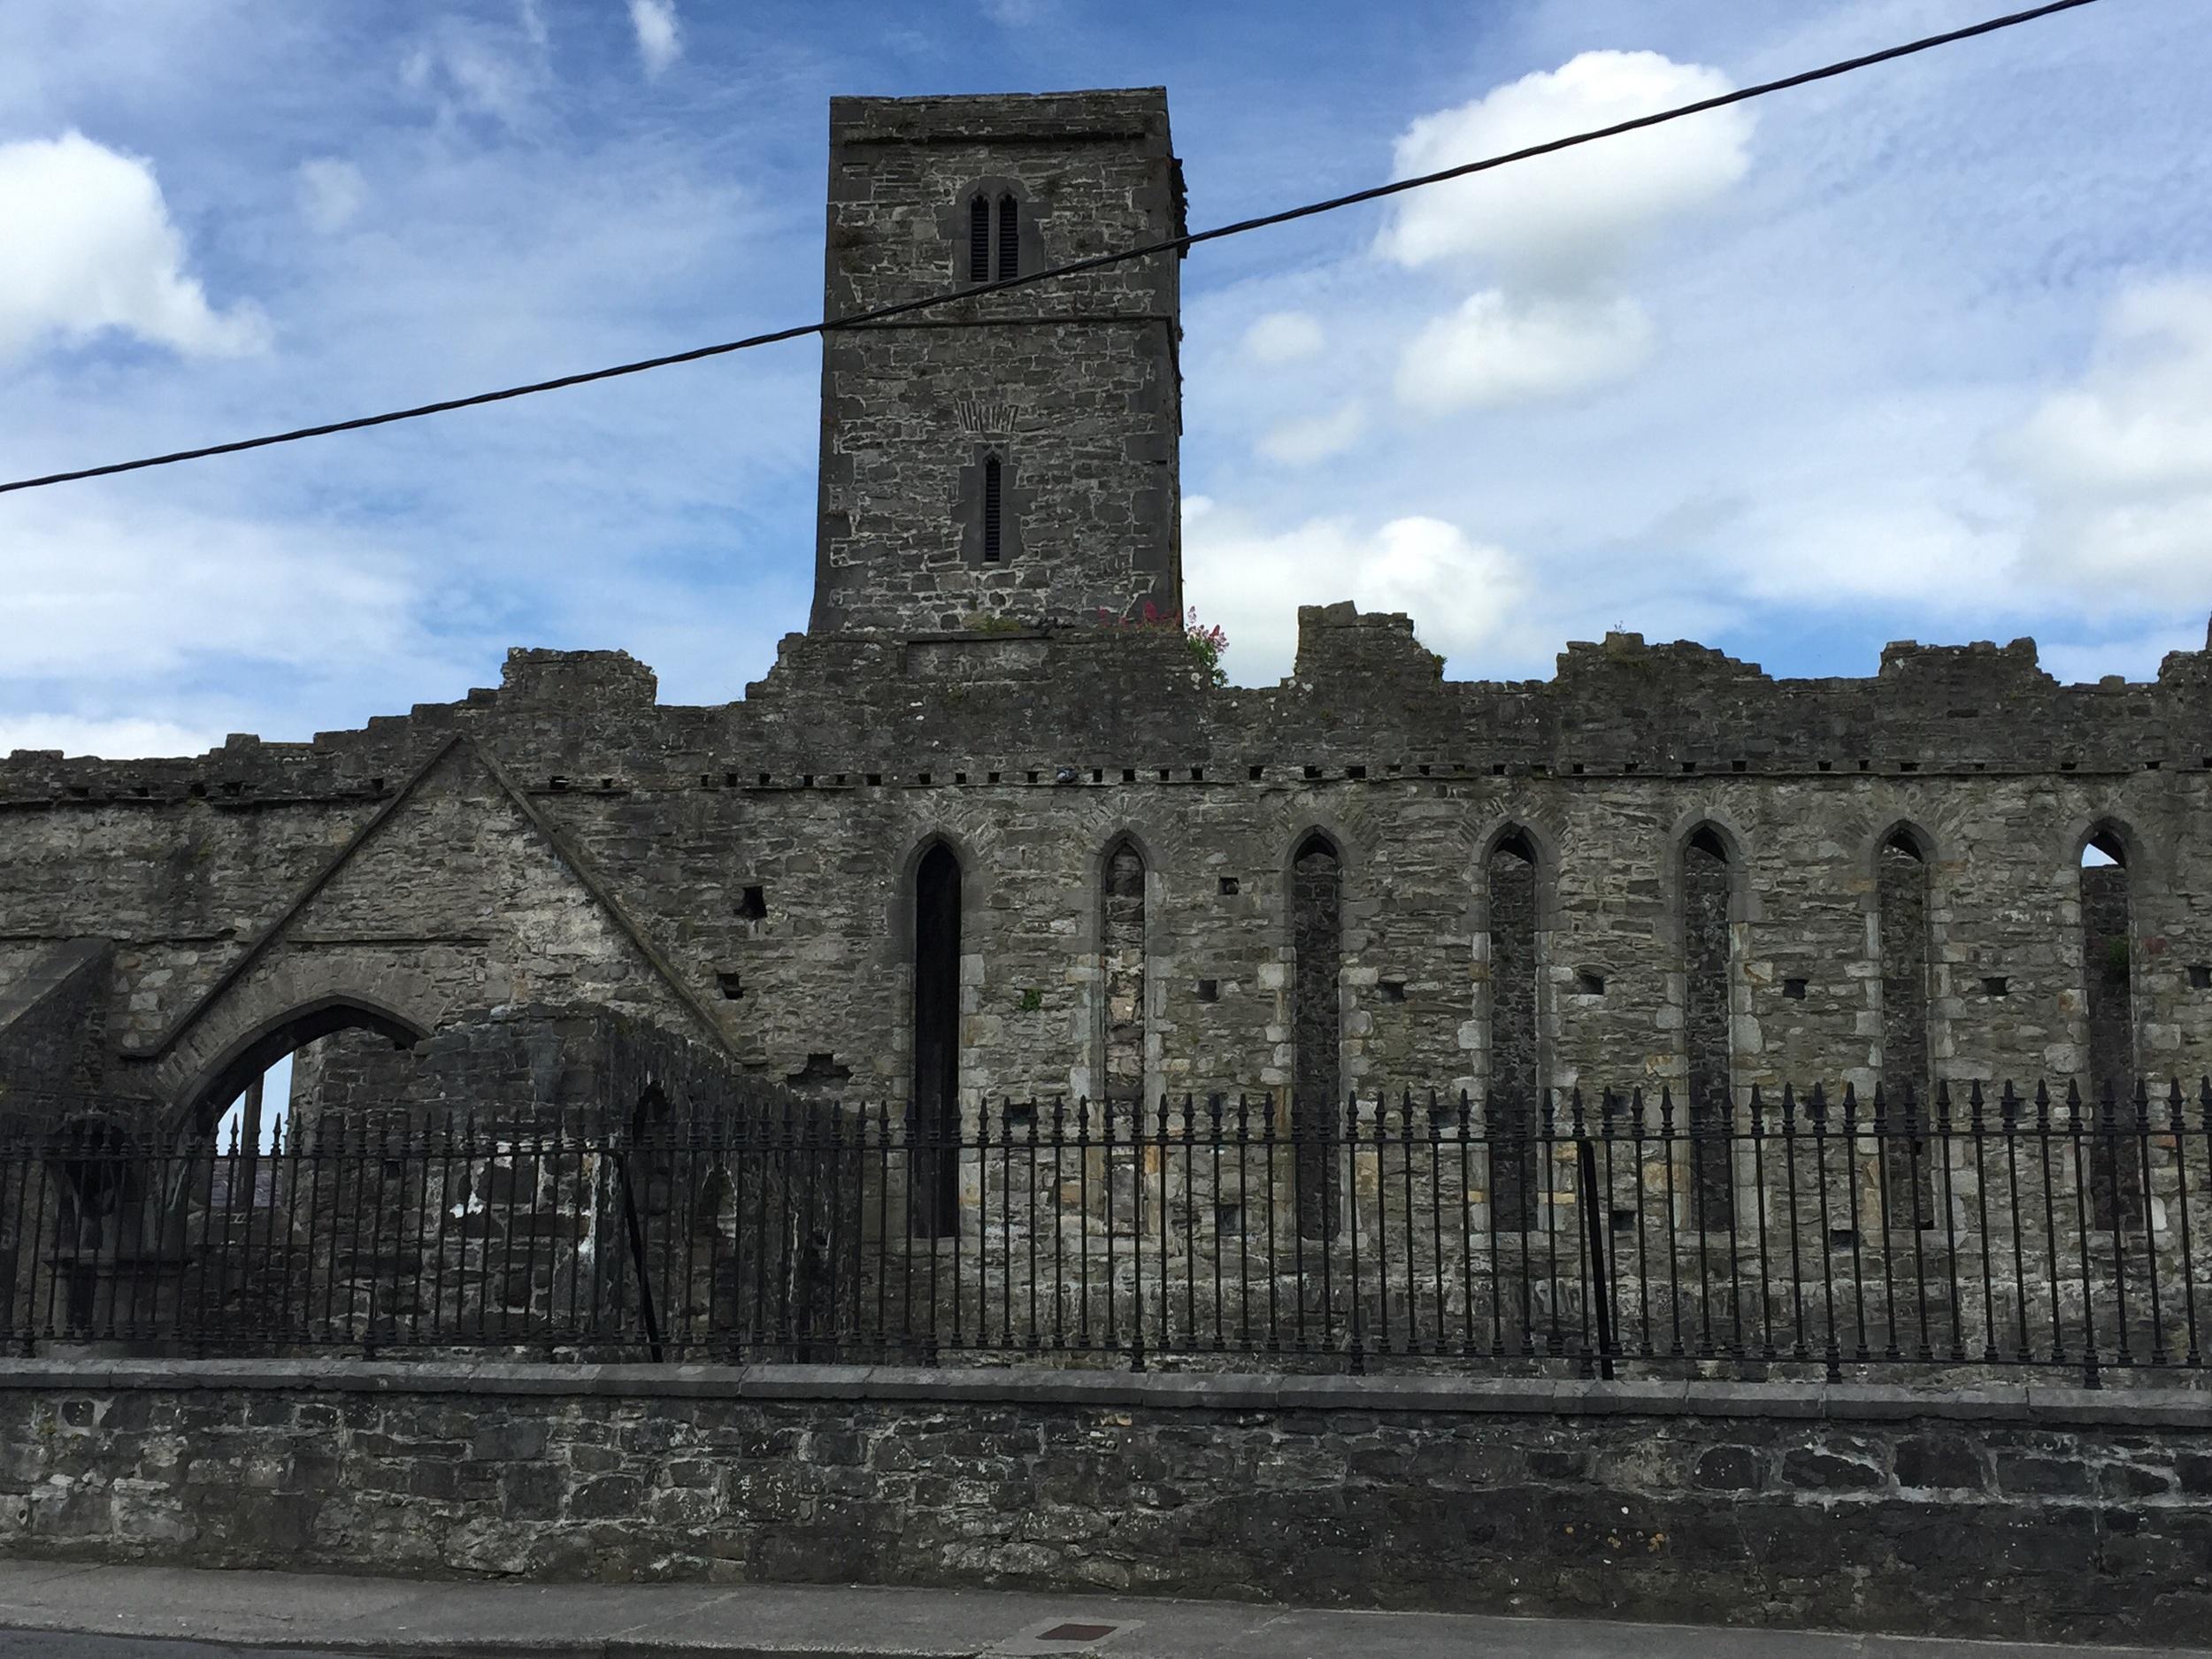 Sligo Abbey from the street.